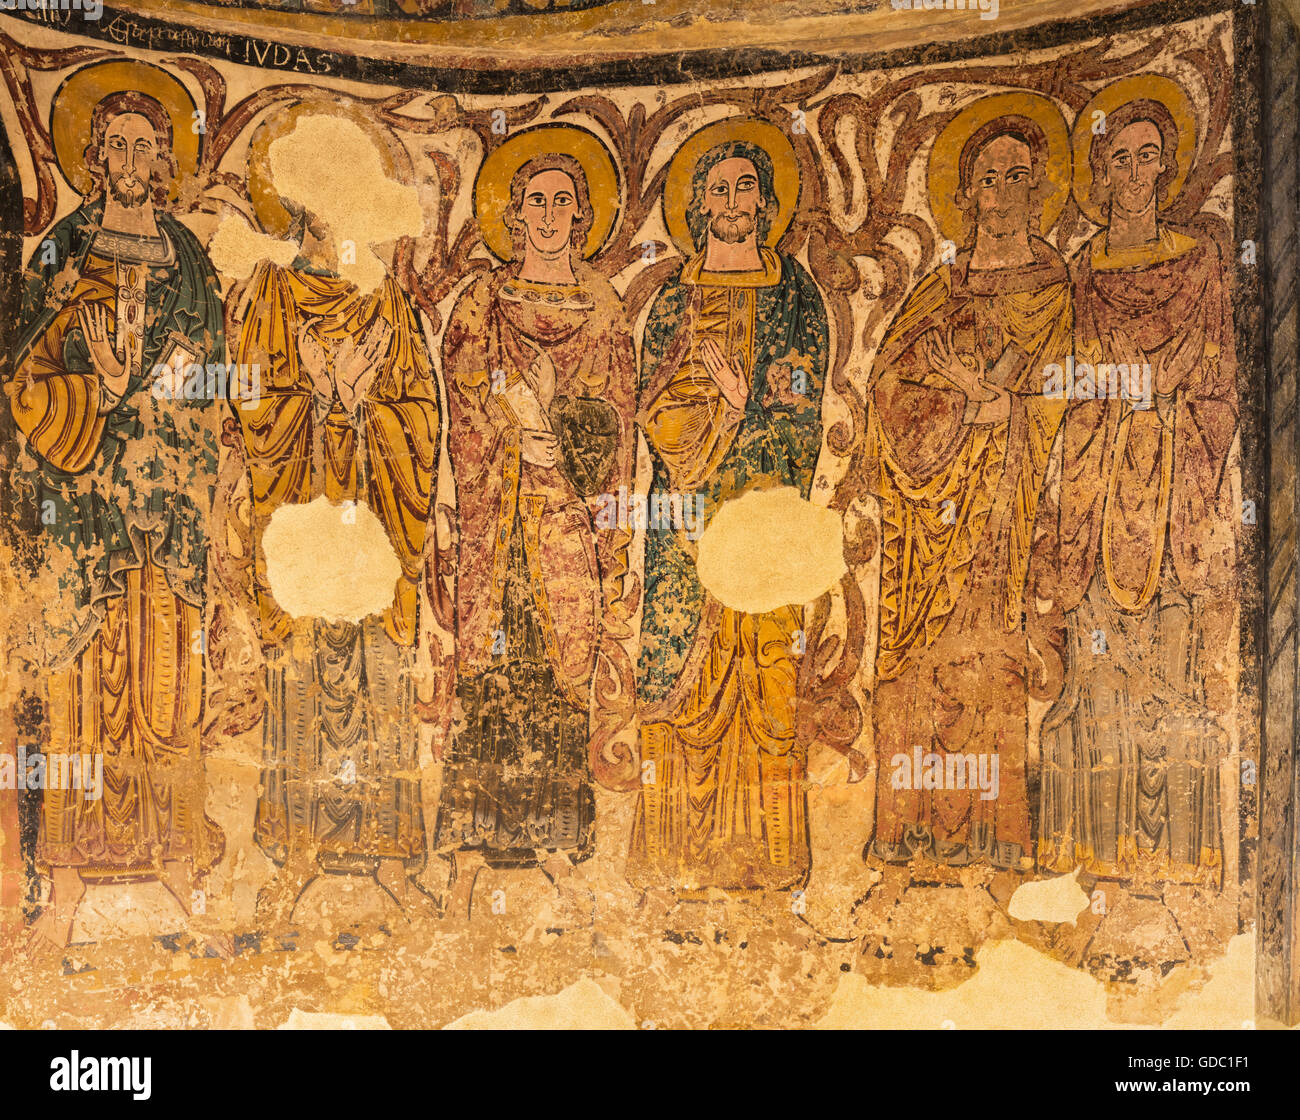 Jaca, Huesca Province, Aragon, Spain.  Diocesan Museum of Jaca (Museo Diocesano de Jaca). Detail of the apostles. - Stock Image